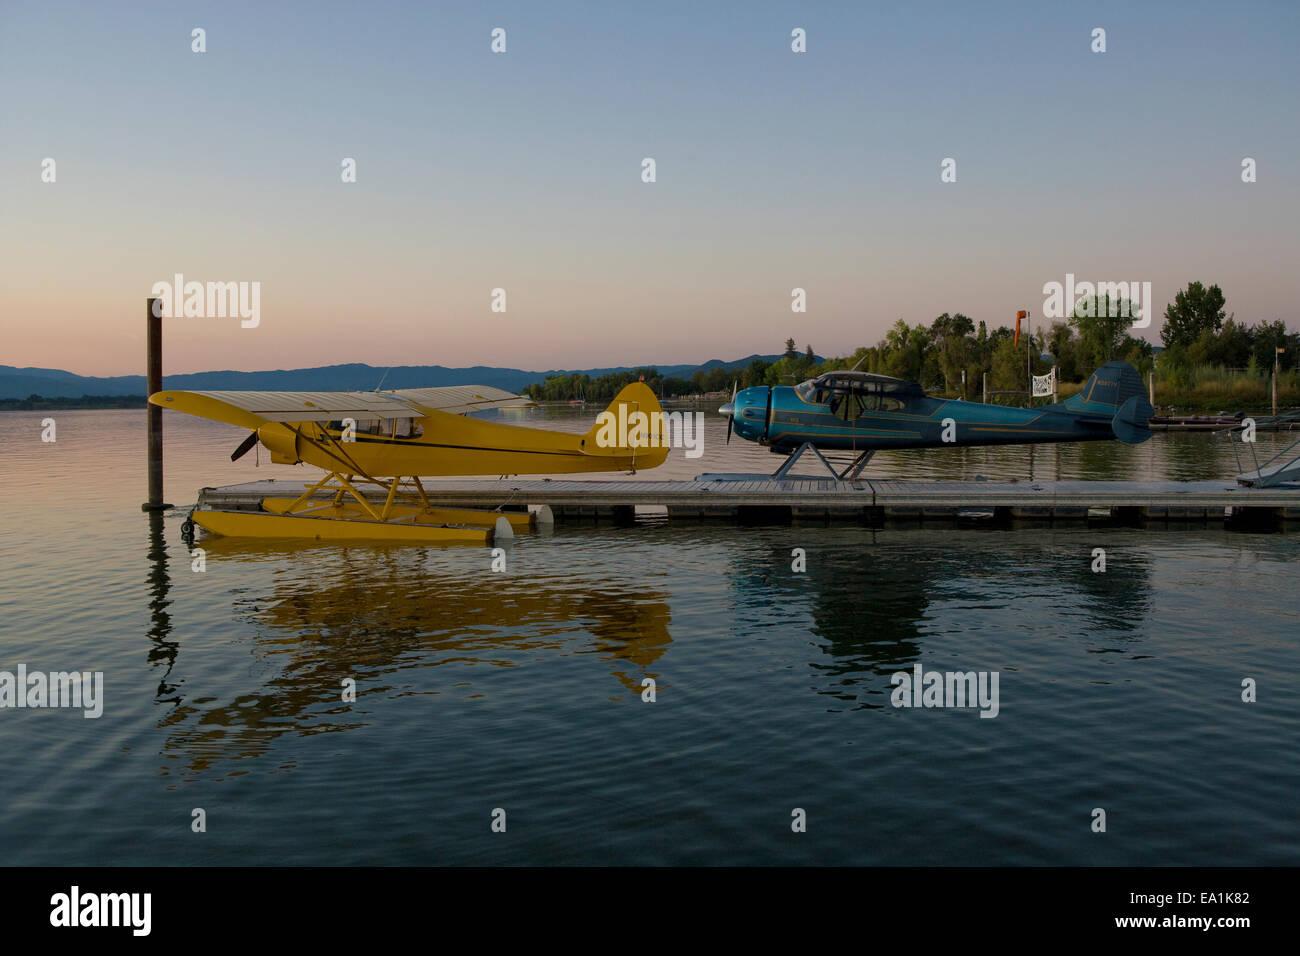 Cessna 195 and PiperSuper Cub docked at the Sky Lark Resort, Seaplane Splash-In, Lakeport, California, Lake County, - Stock Image